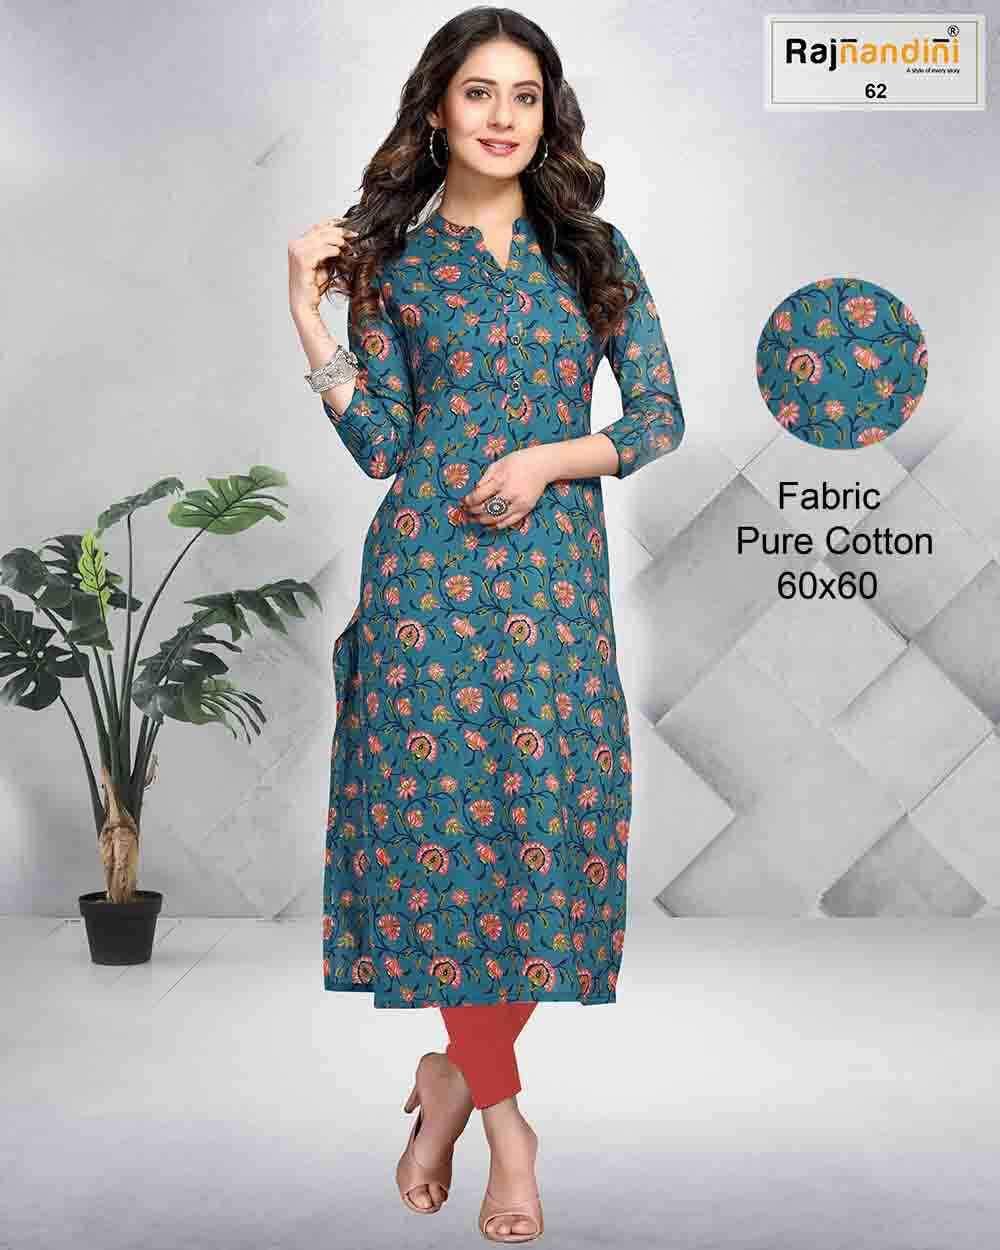 Rajnandini Vol 8 Casual Wear Jaipuri Print Kurti Catalog Supplier